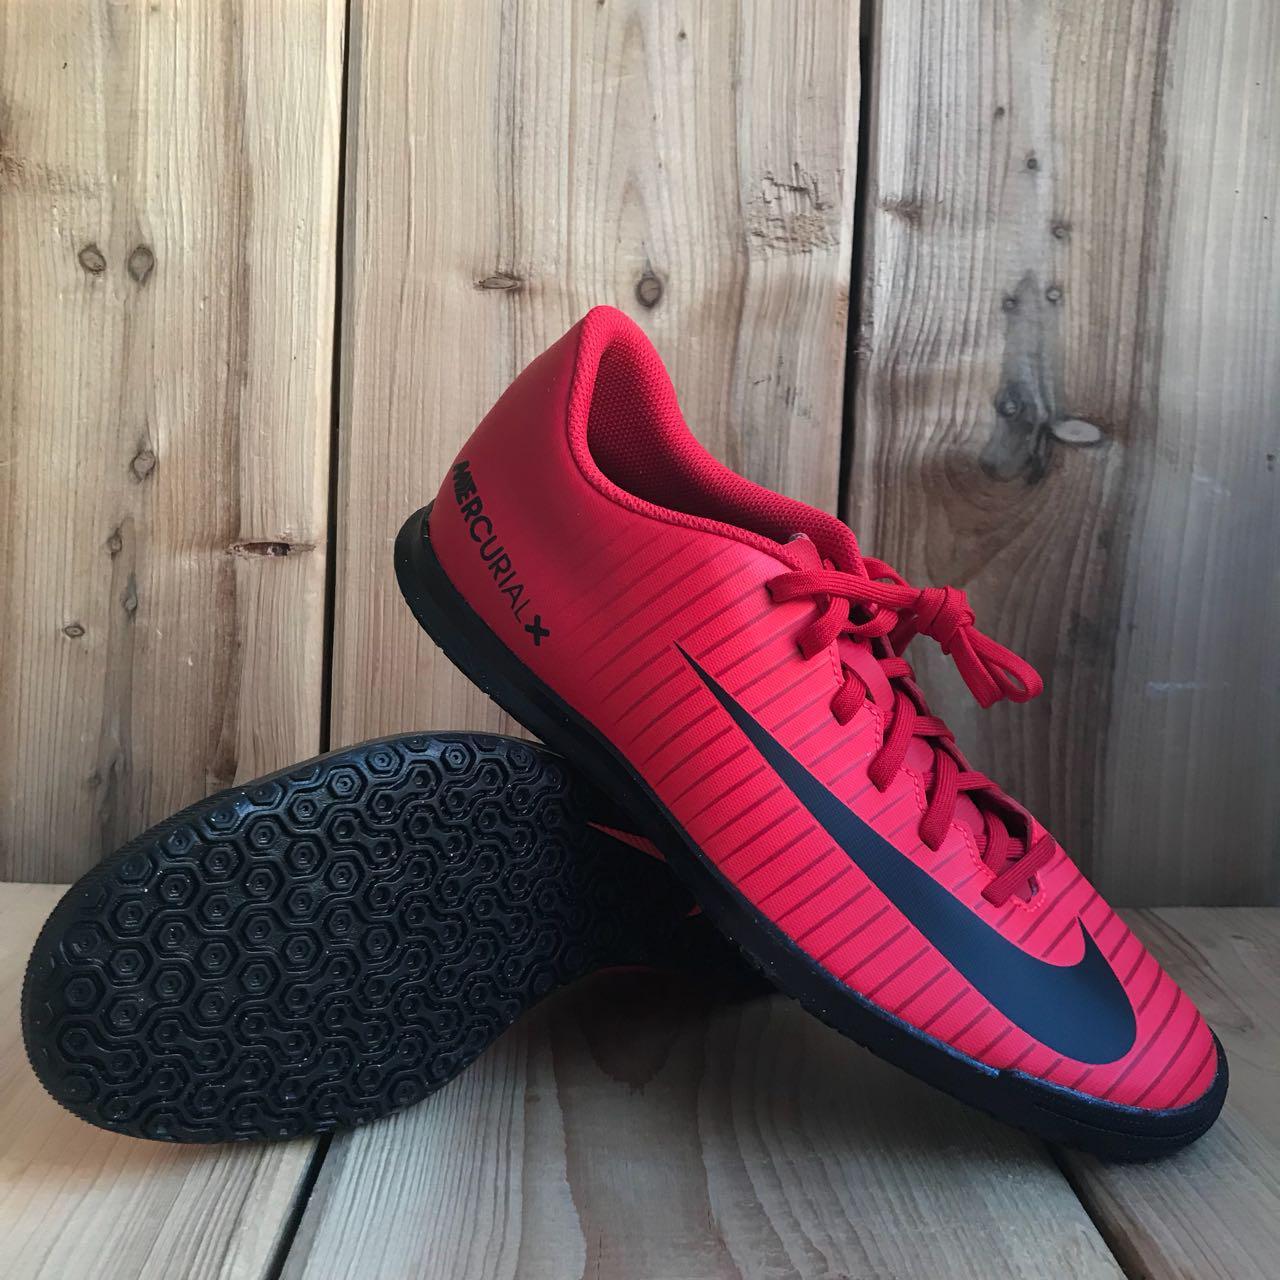 ca6eb16672a6 Футзалки Nike MERCURIALX VORTEX III IC 831970-616 Найк Меркуриал (Оригинал)  - Football